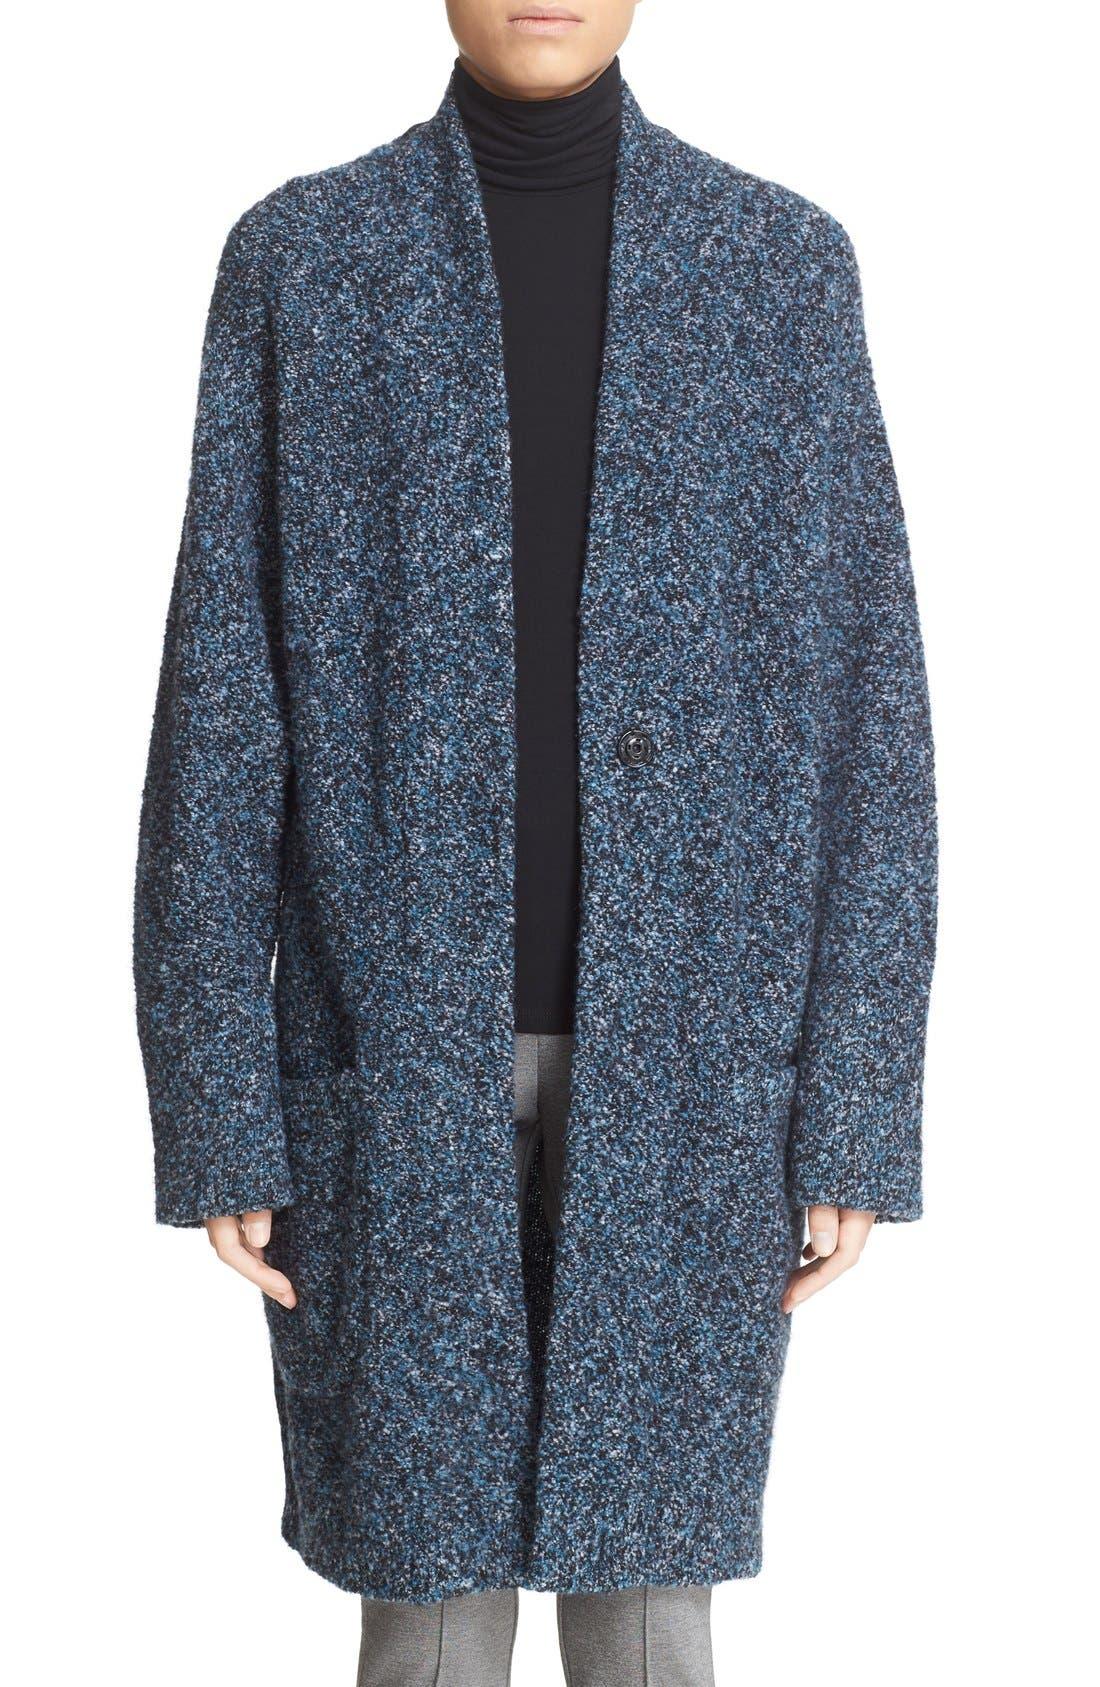 'Diana' Sweater Coat,                         Main,                         color, 474